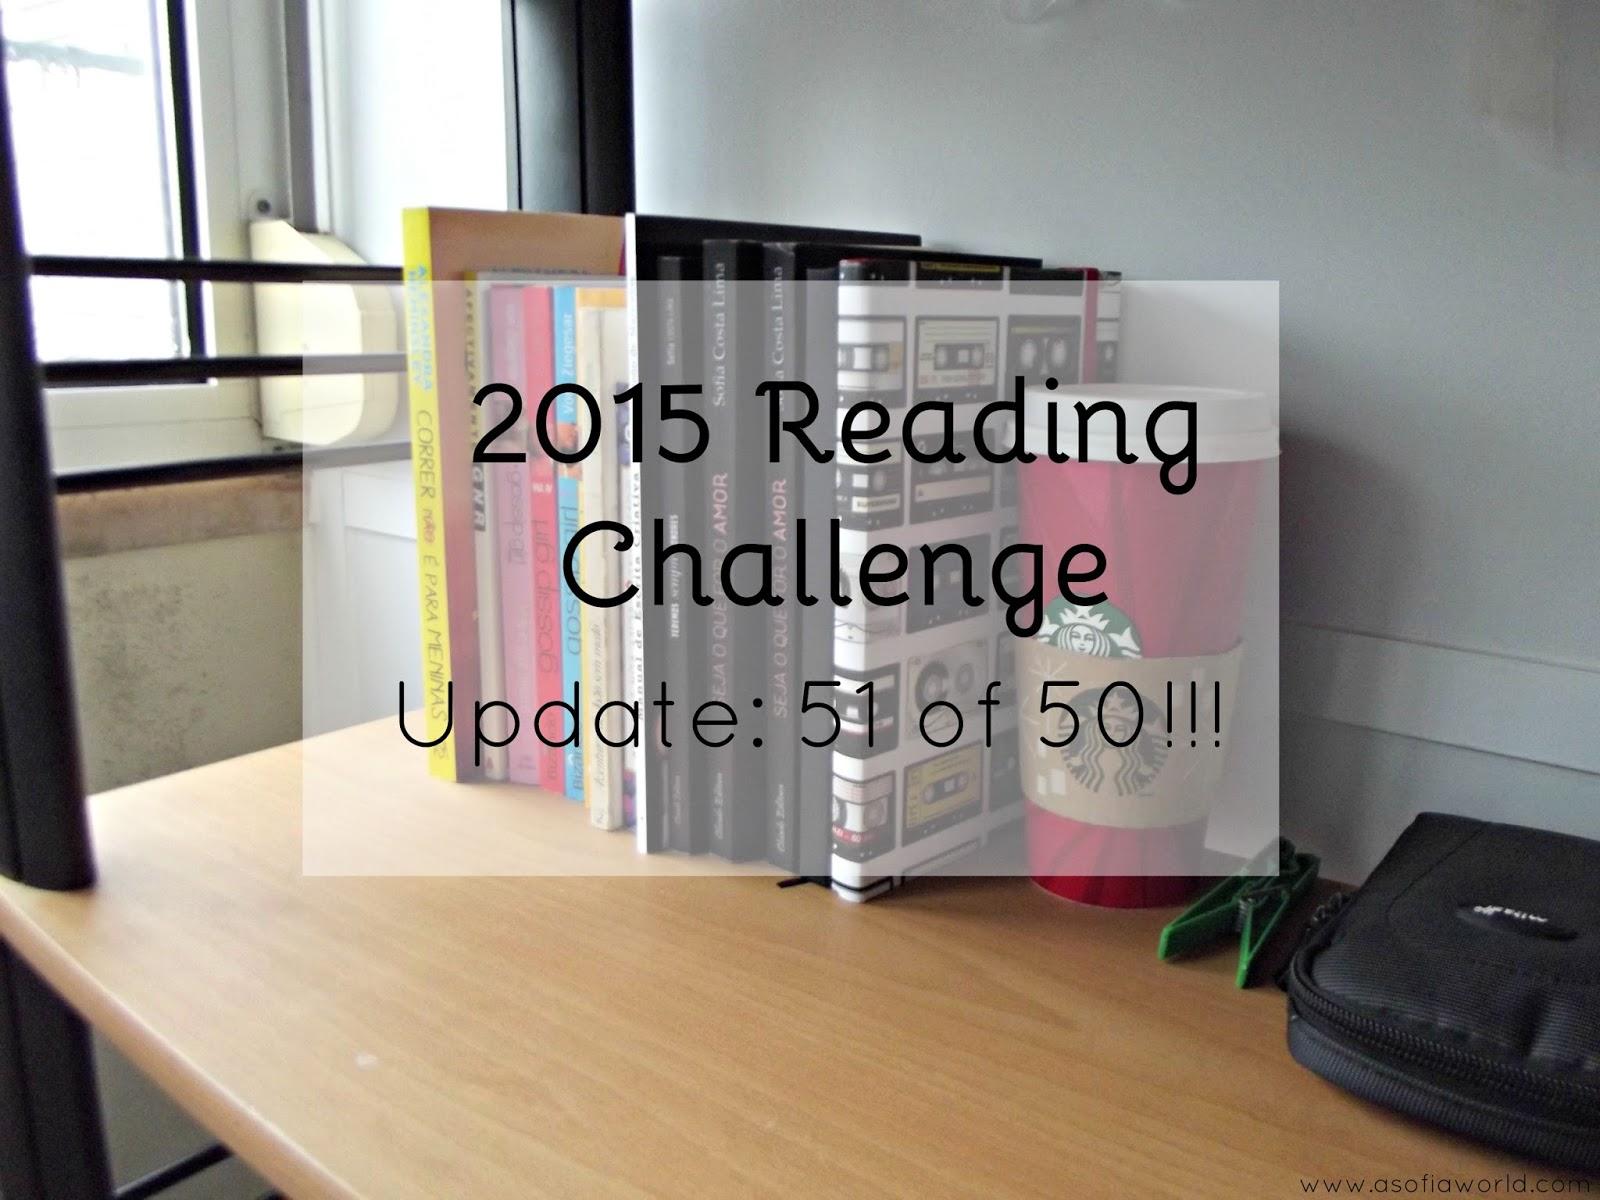 2015 Reading Challenge Update